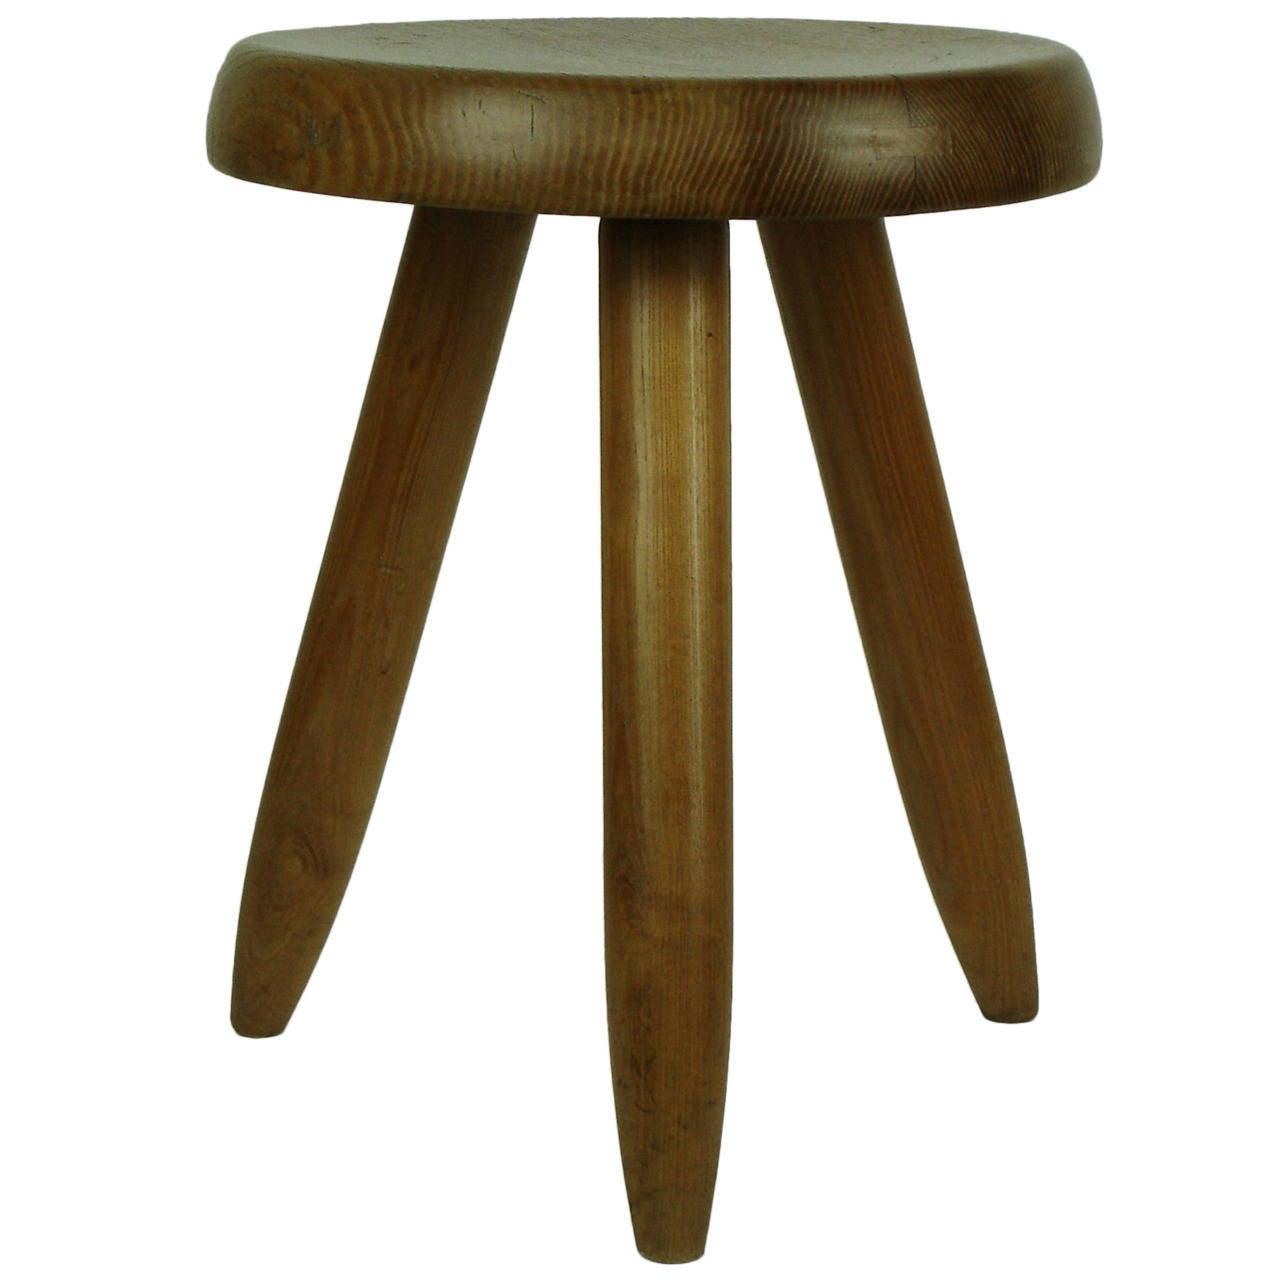 Charlotte Perriand stool, ca. 1950